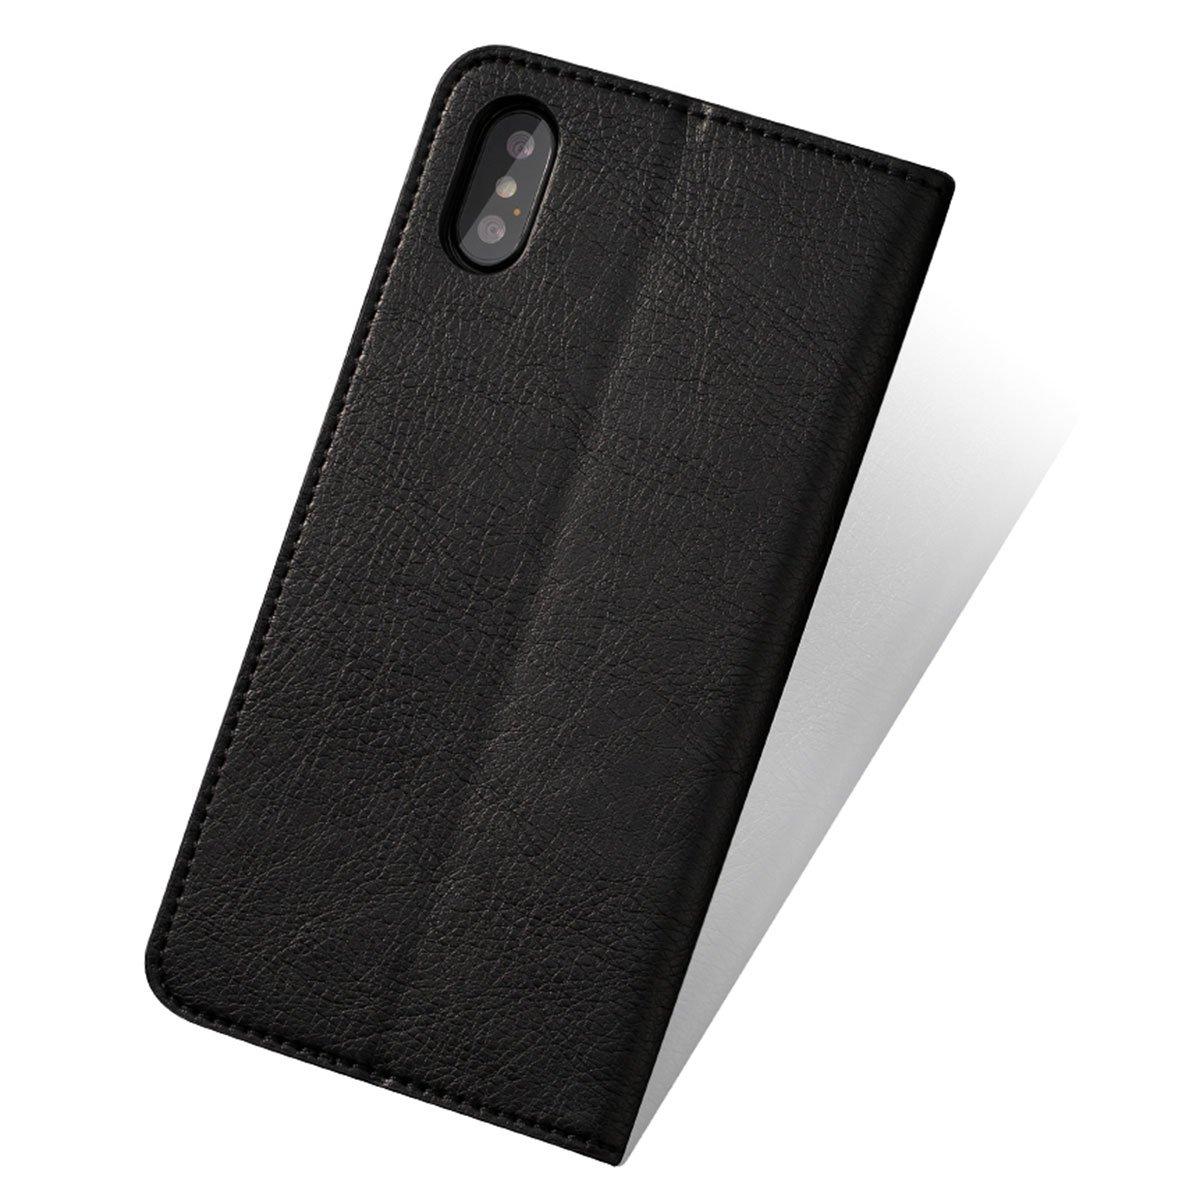 74cc278356 Amazon.co.jp: MINIBA MINIBA iPhoneケース カバー 最新型iPhoneX対応 手帳型 アイフォンX 牛革本革レザー  横開き スタンド機能付き (ブラック): シューズ&バッグ